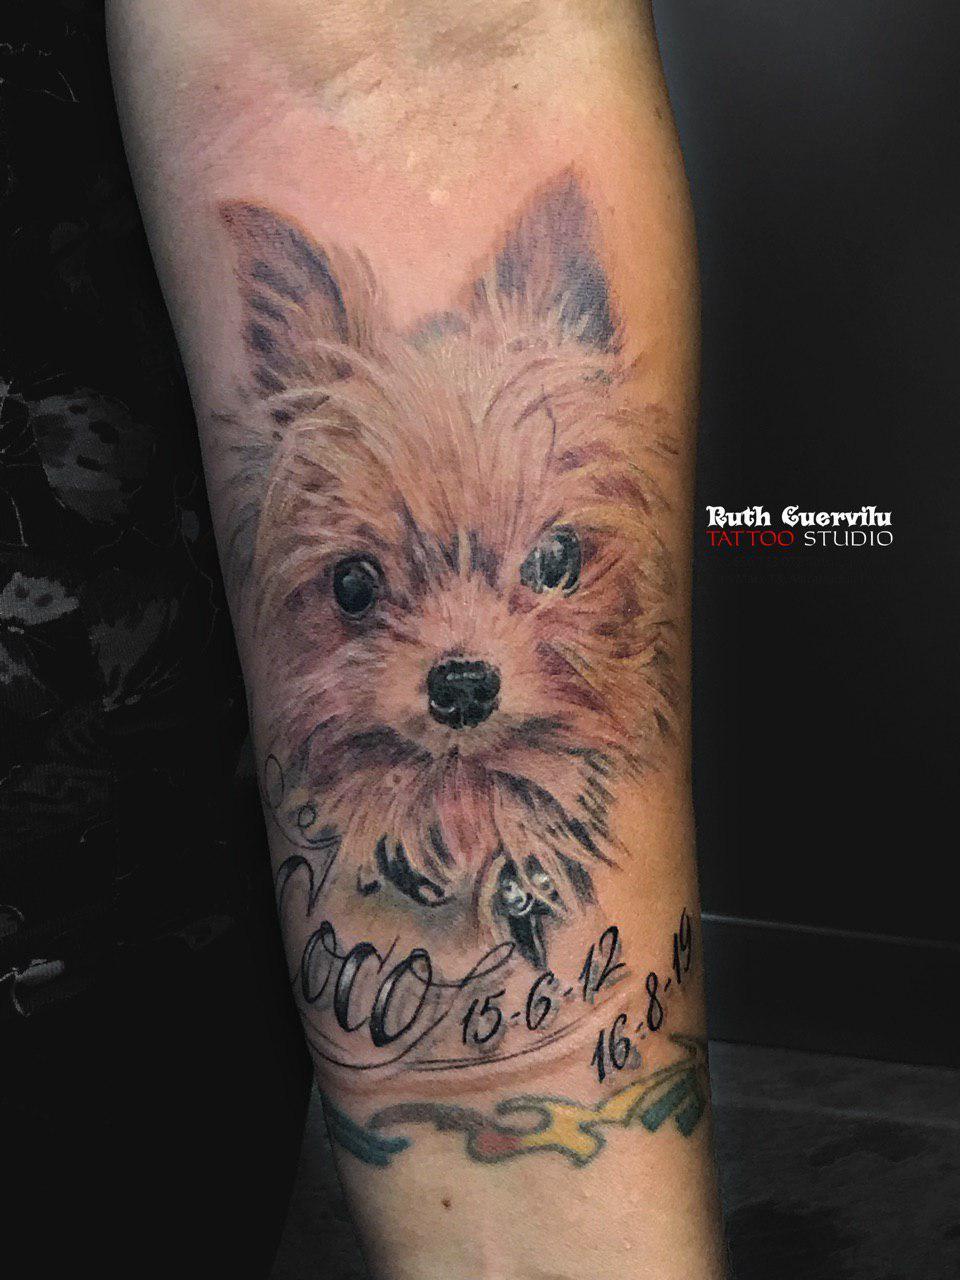 Retrato Coco Tatuaje - Ruth Cuervilu Tattoo - KM13 Studio - Astrabudua Erandio Bilbao